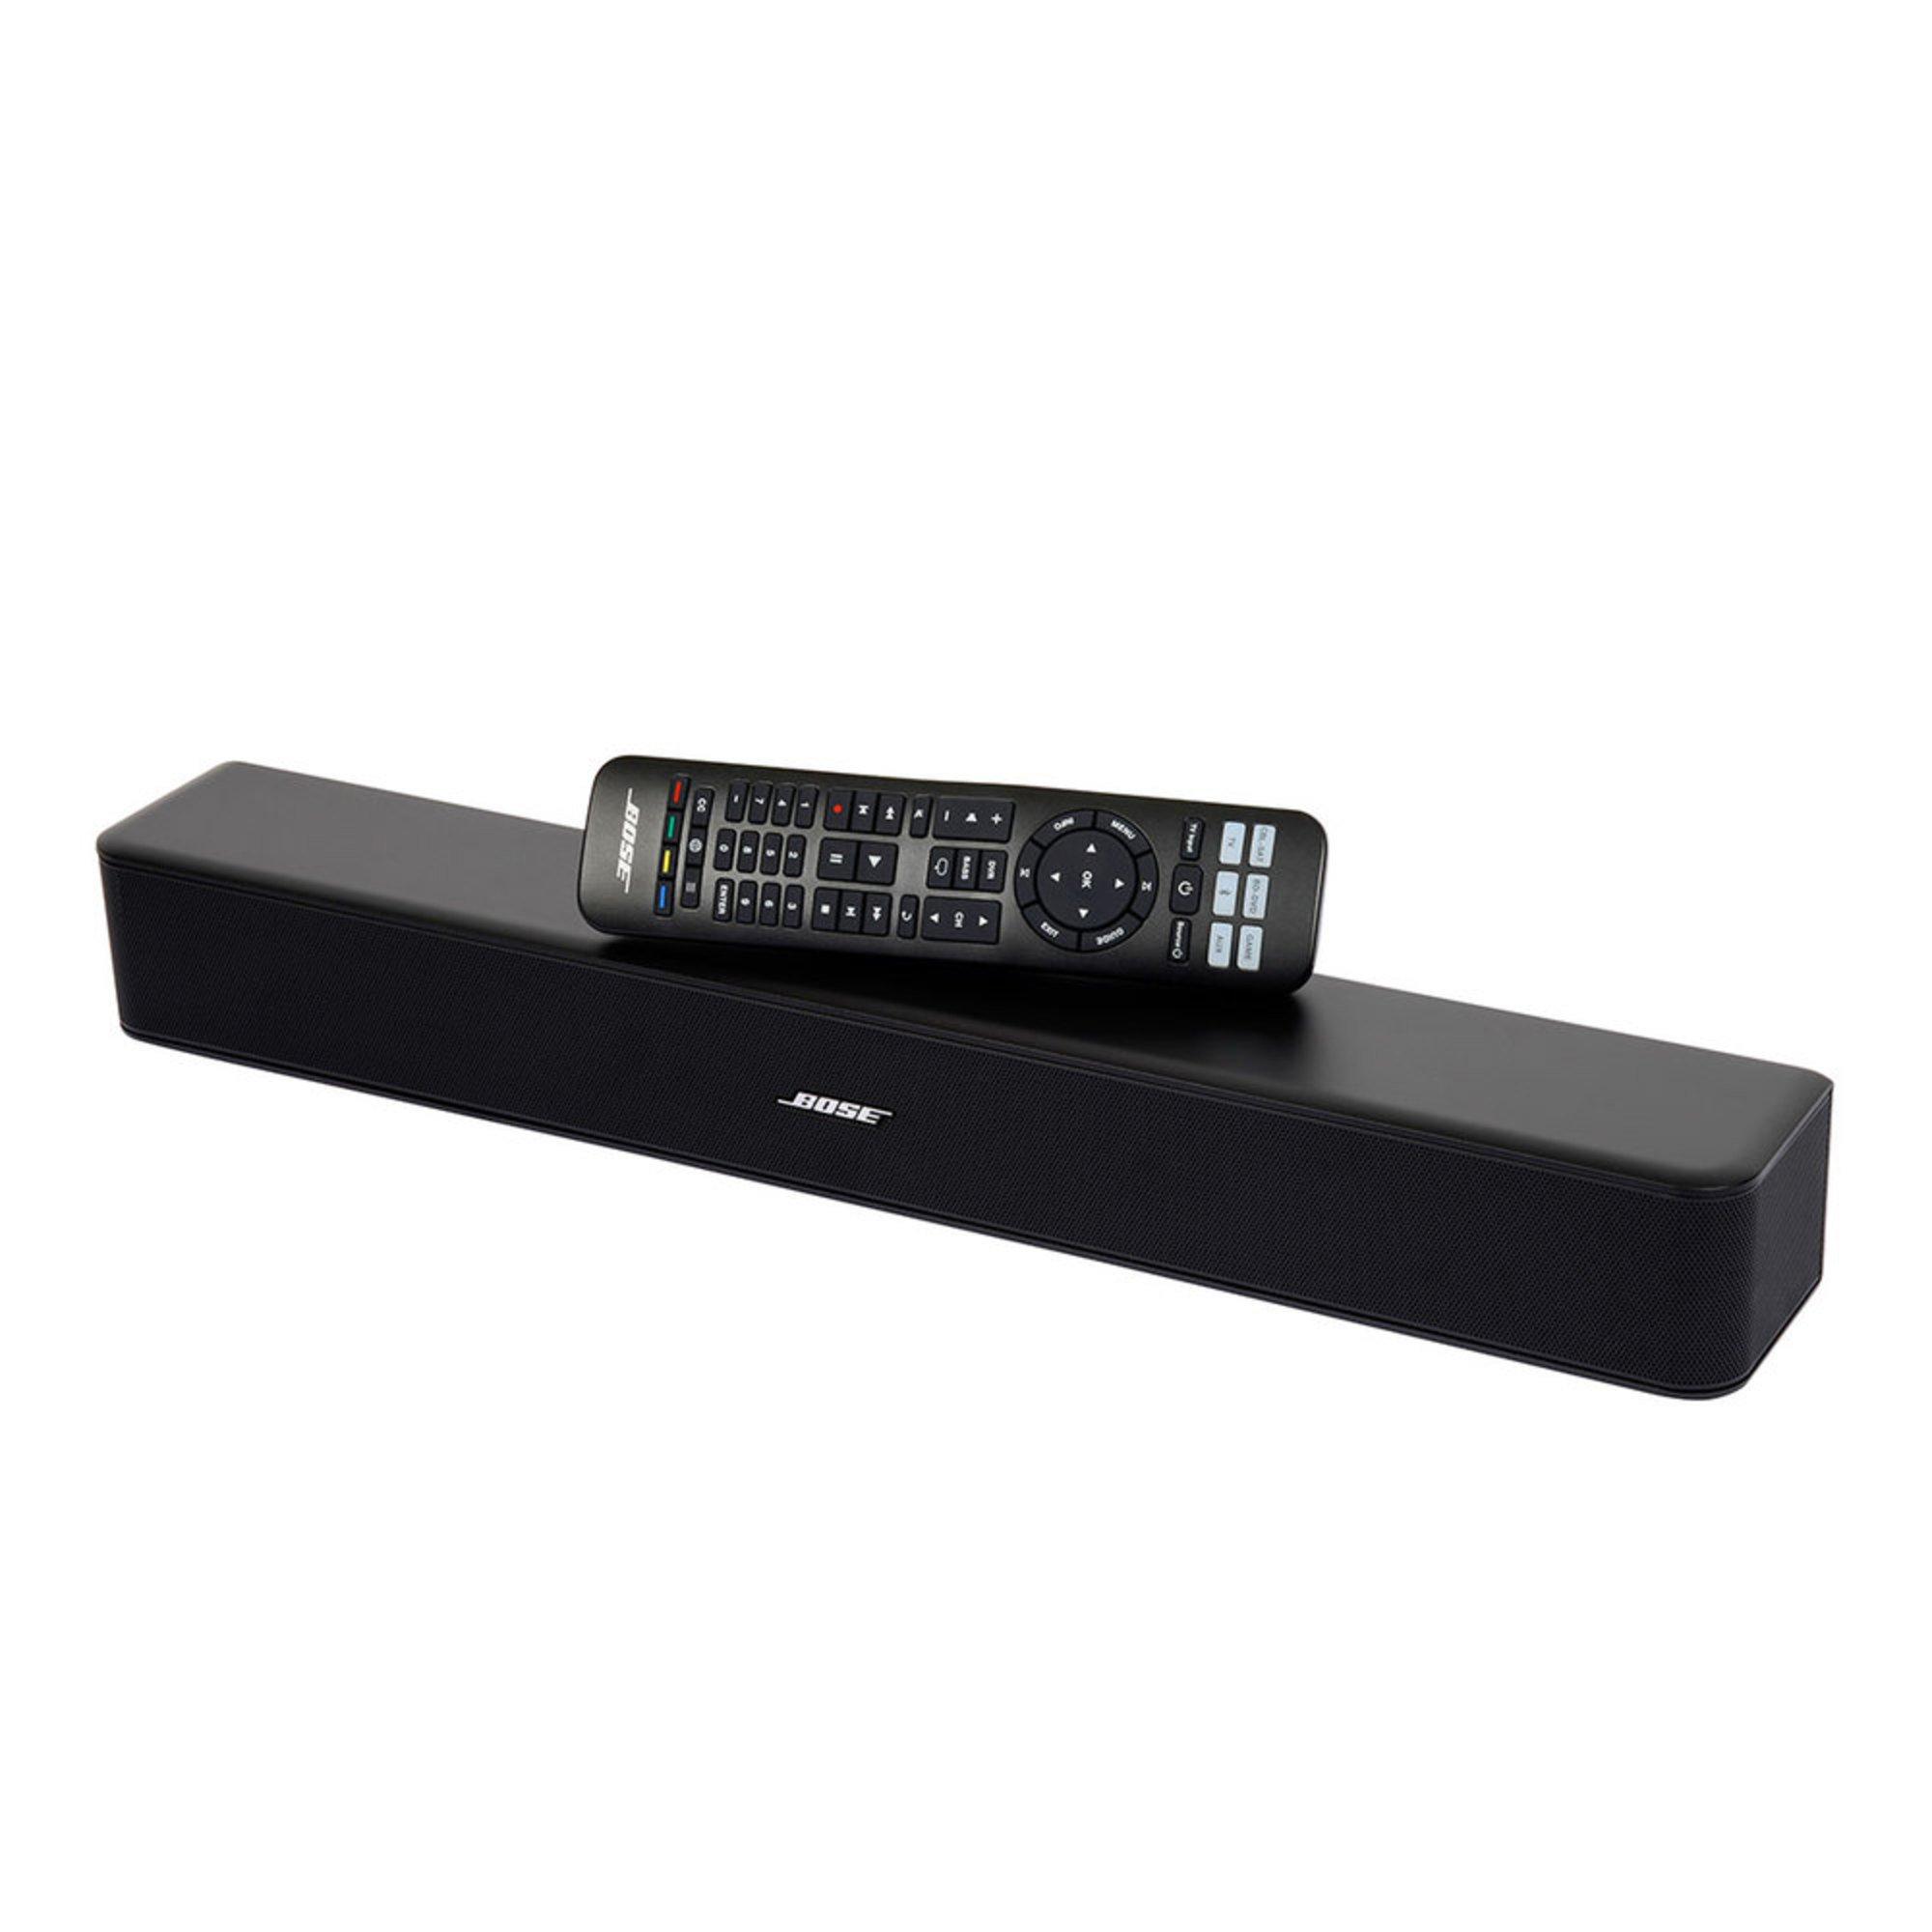 Bose Solo 5 Tv >> Bose Solo 5 Tv Sound System Soundbar Systems Electronics Shop